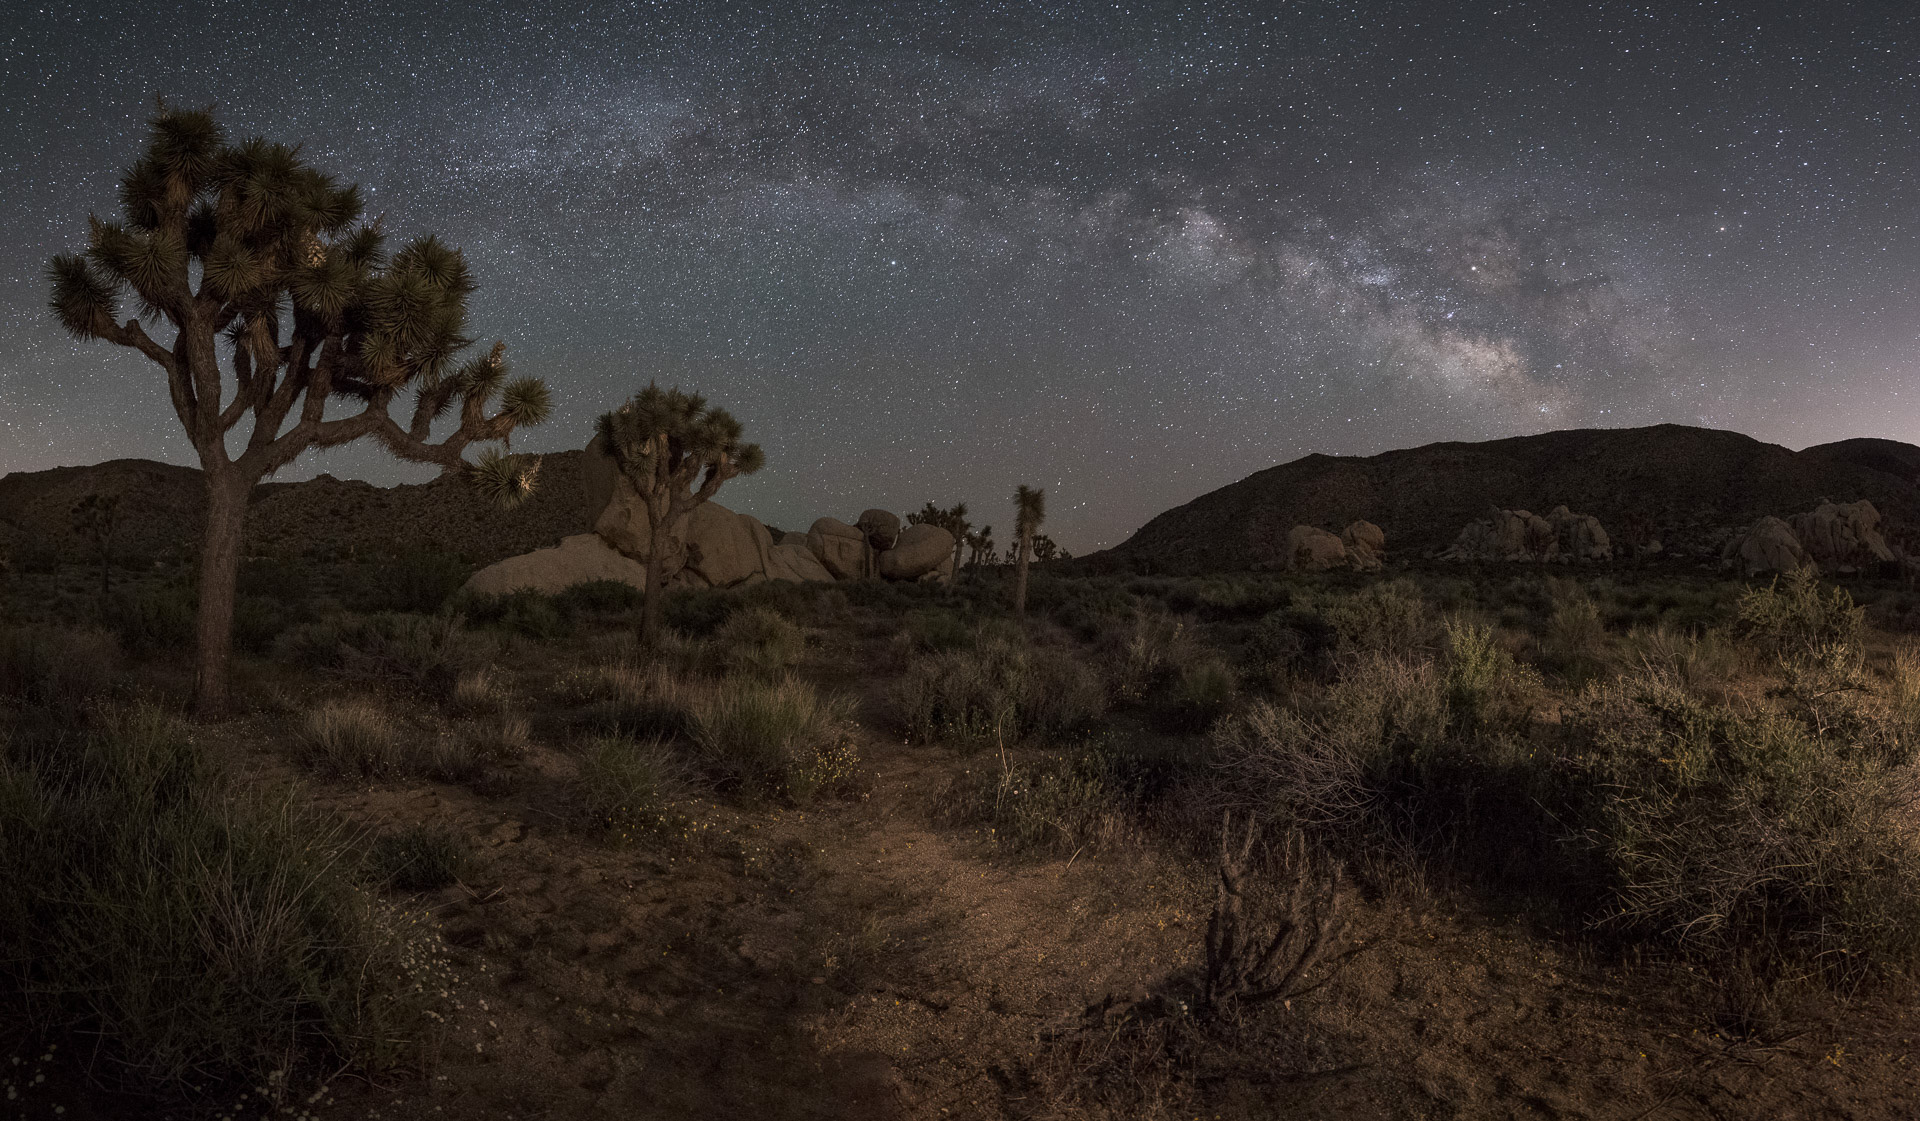 Joshua Tree National Park, © 2017 Lance Keimig